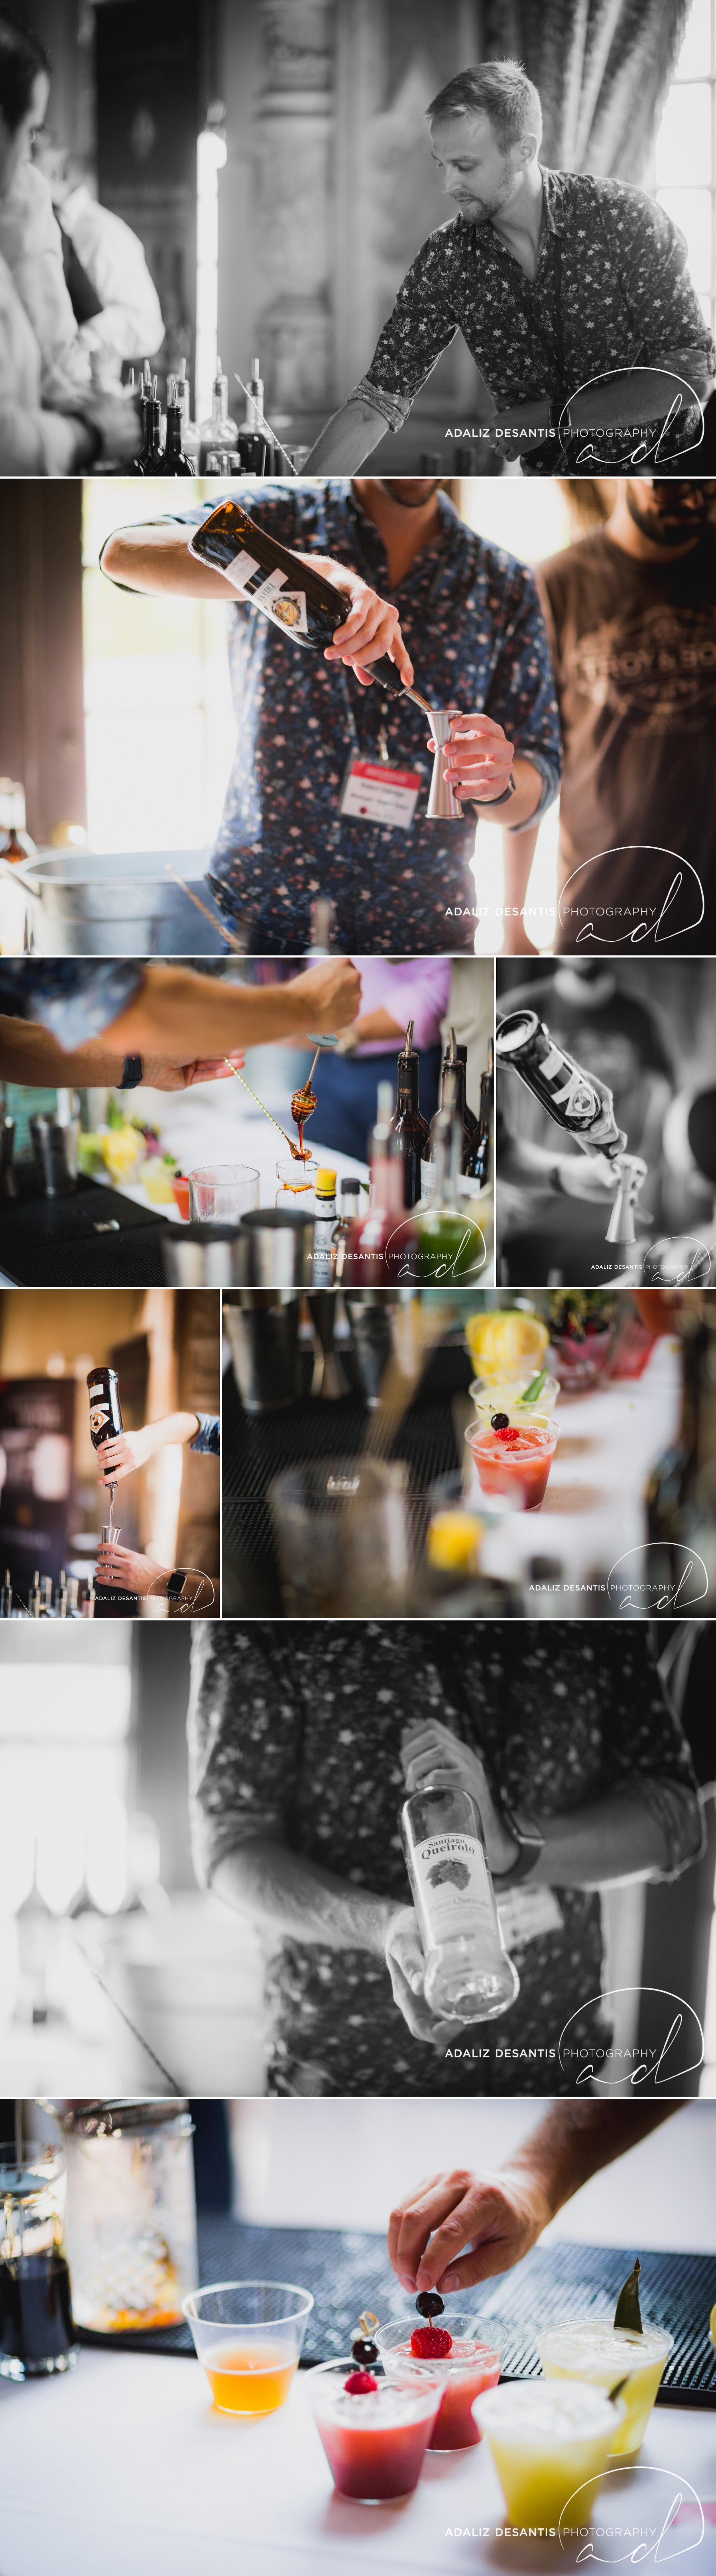 hidalgo imports anniversary wine spirits tasting biltmore hotel coral gables florida miami 11.jpg